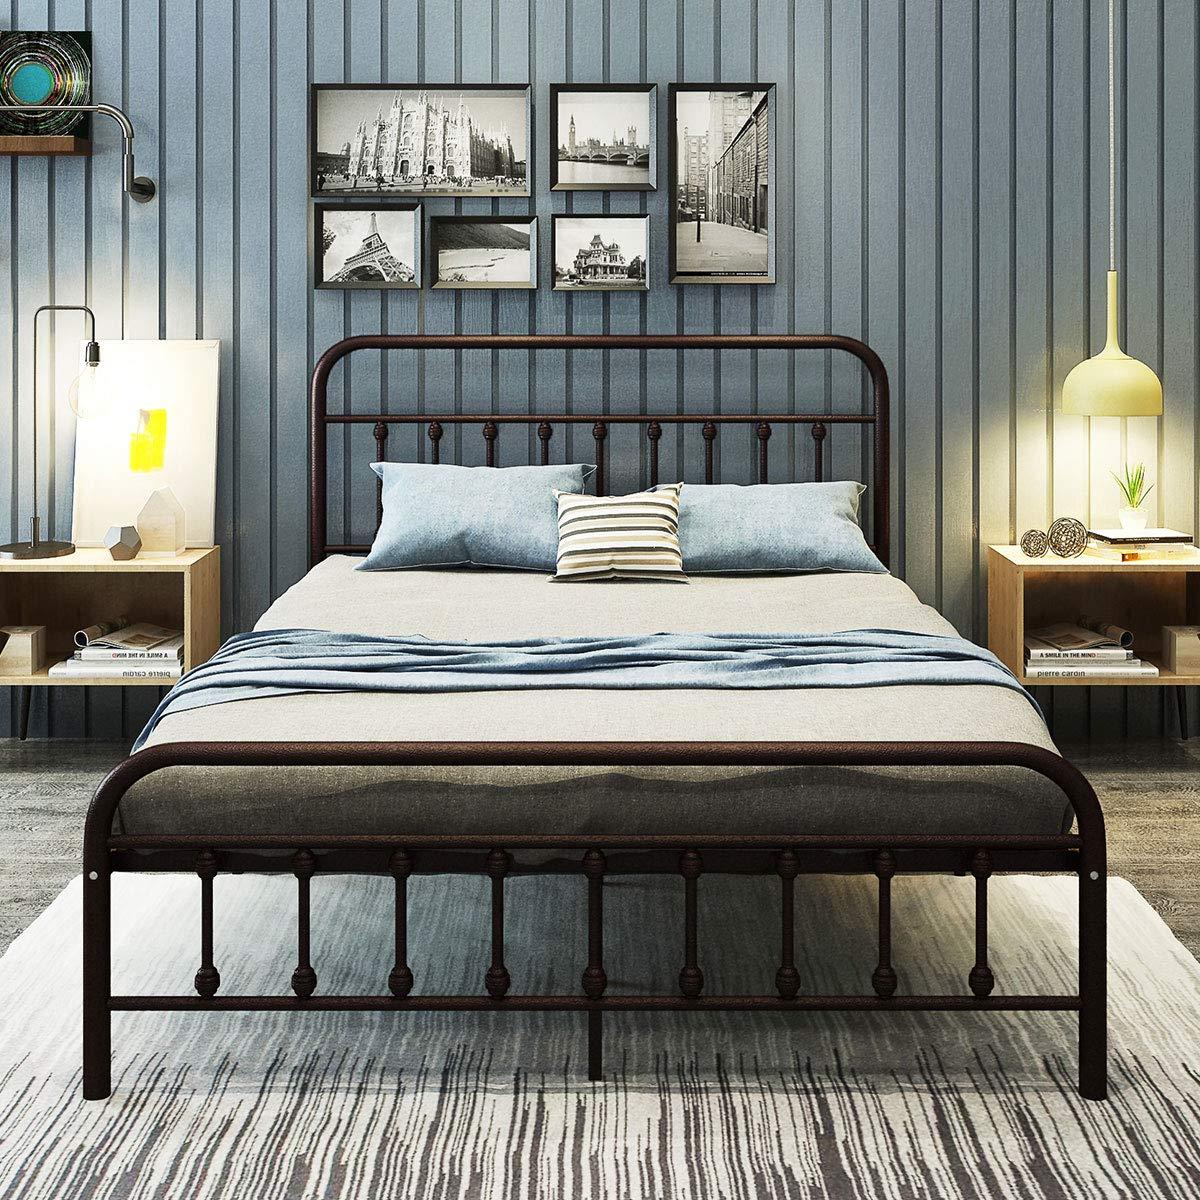 Metal Bed Frame Queen Size Platform with Vintage Headboard and Footboard Sturdy Metal Frame Premium Steel Slat Support Bronze